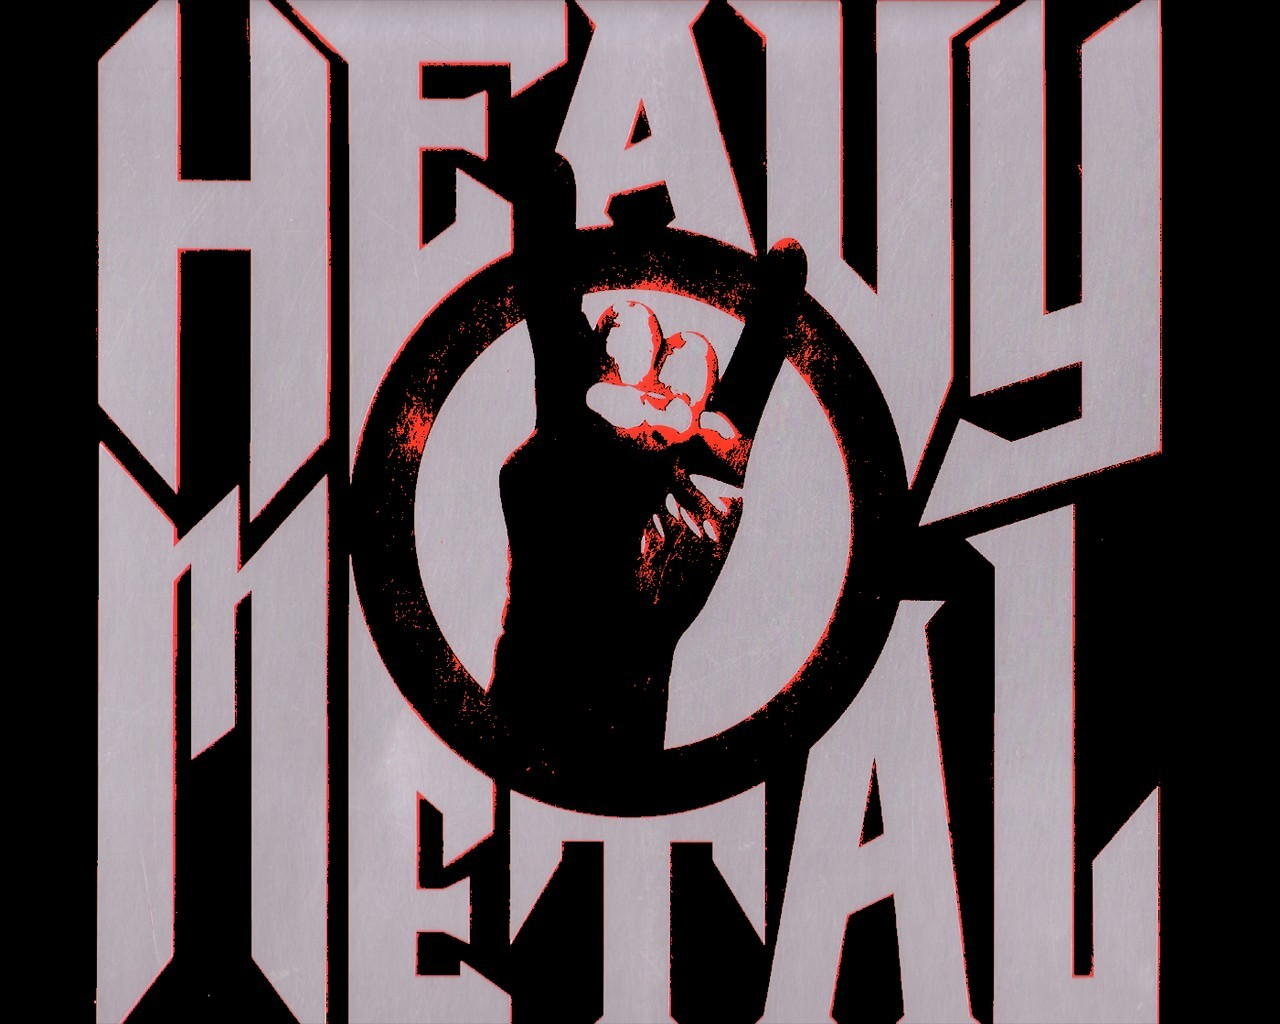 Heavy Metal BBC Film Explores the Music, Personalities ...